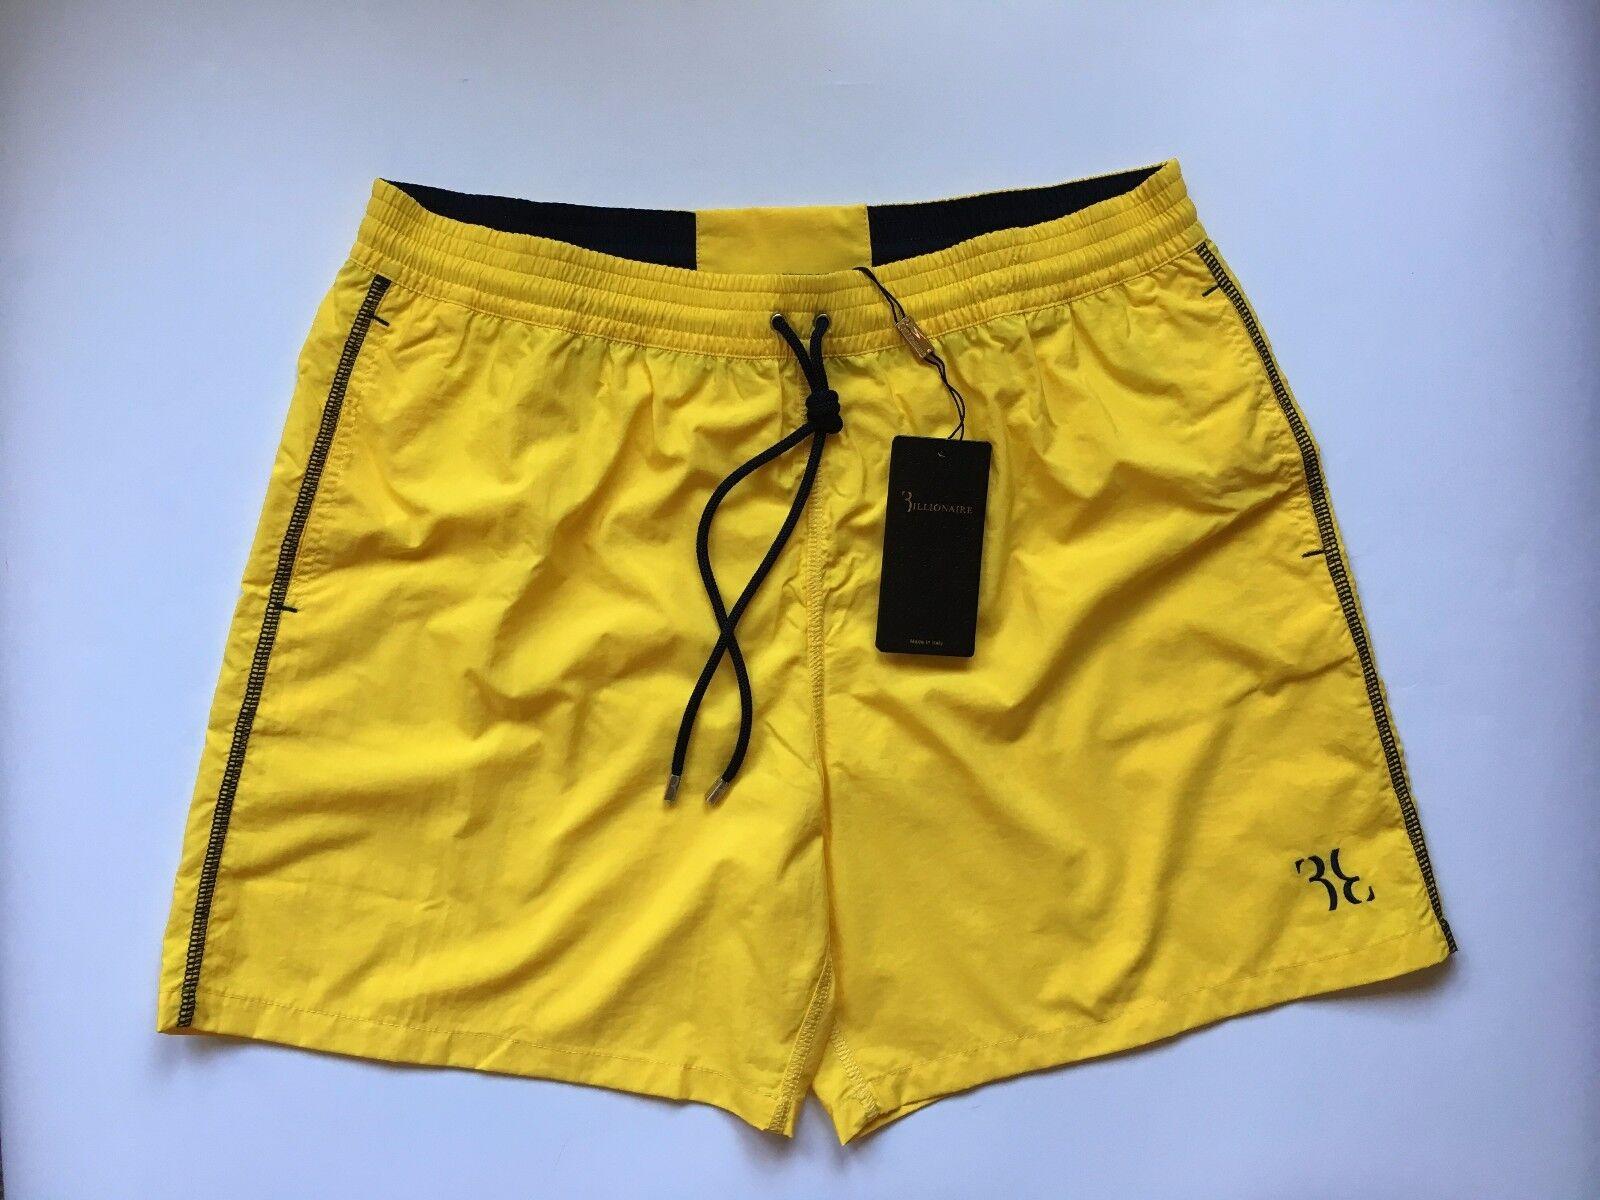 Billionaire Couture Men's Yellow Swimwear Shorts 100% PA sizes  54 2XL, 58 4XL